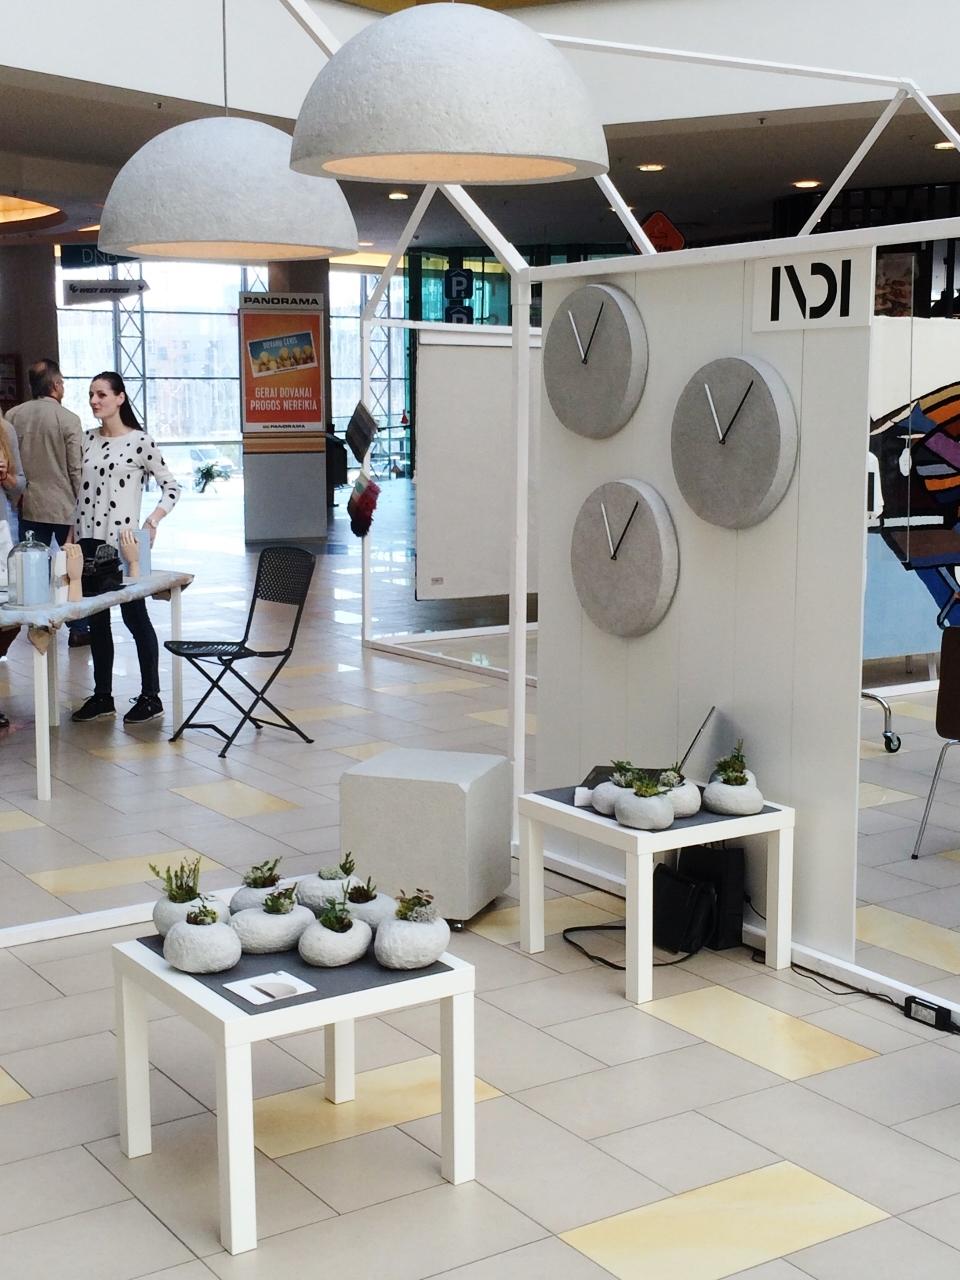 nordisches design aus baltikum vilnius. Black Bedroom Furniture Sets. Home Design Ideas